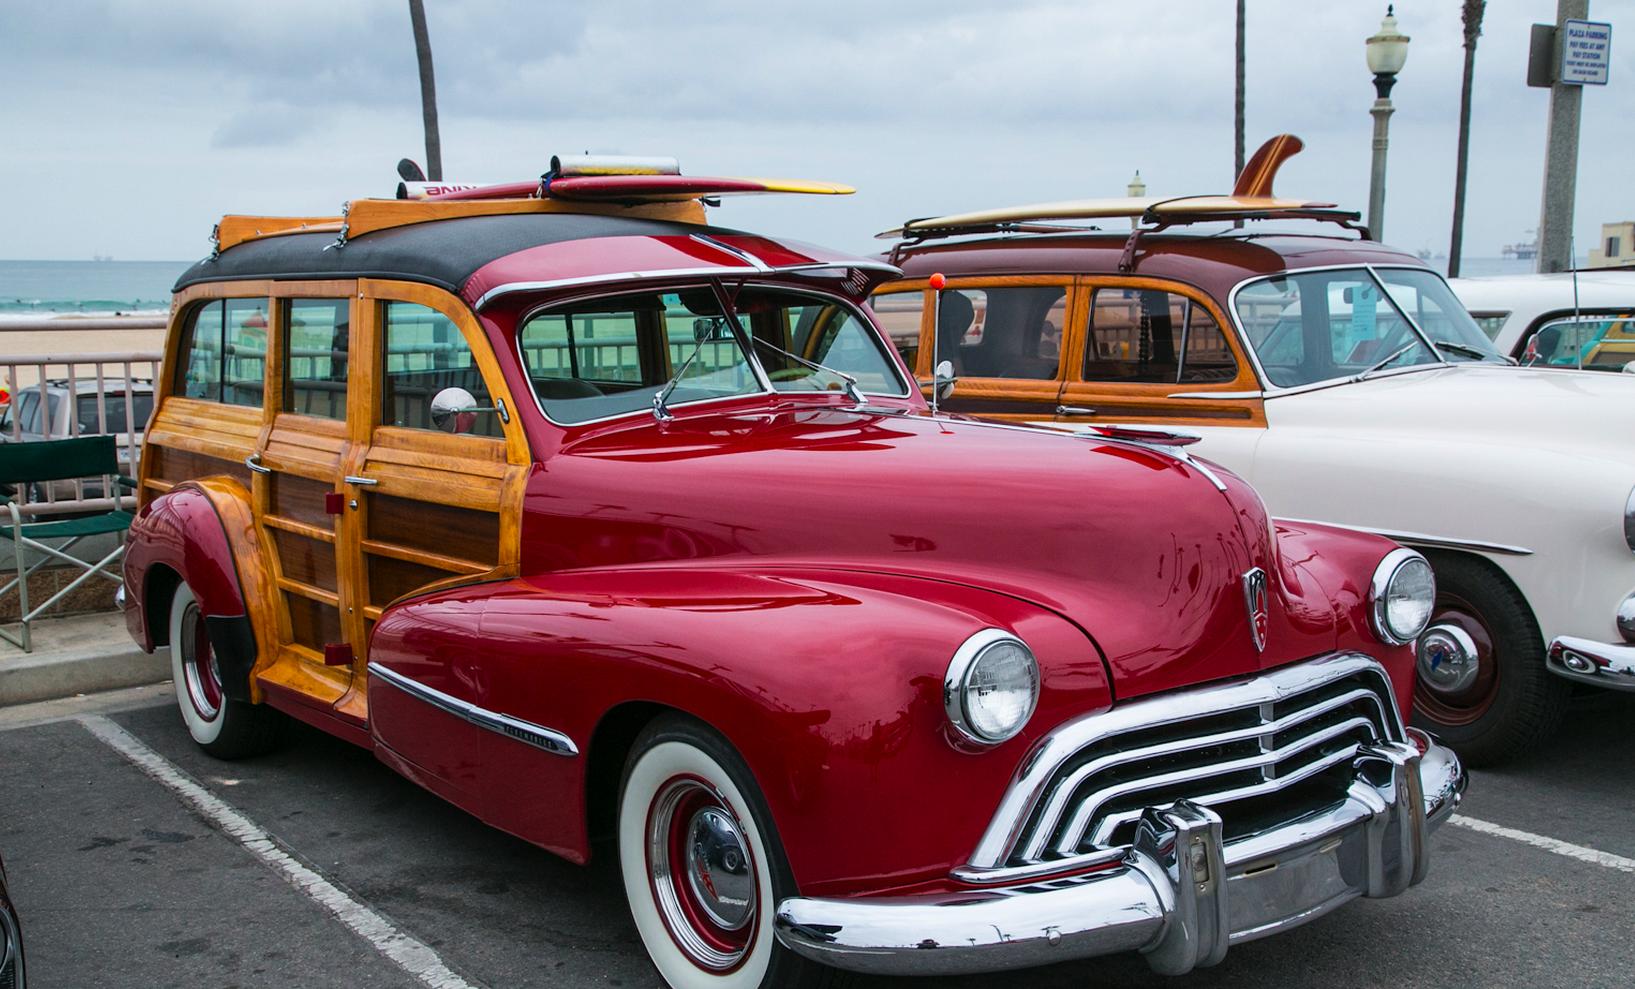 Woodies! Every Woody At The Beachcruiser Car Show At Huntington Beach, California